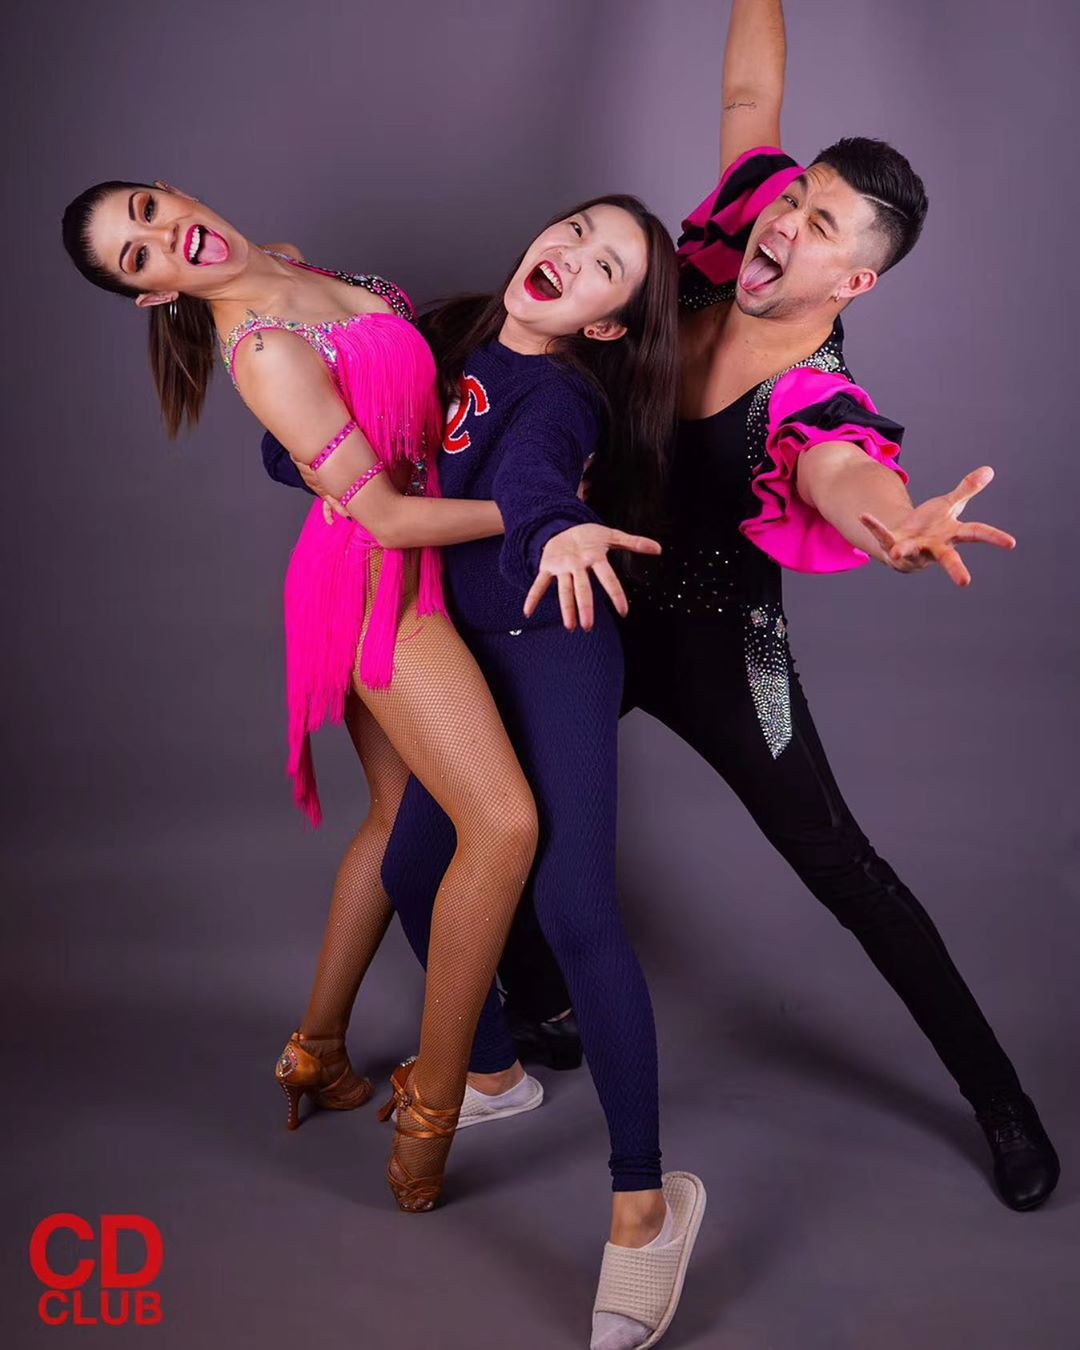 Cyndi Wee fun pic, performing arts, entertainment